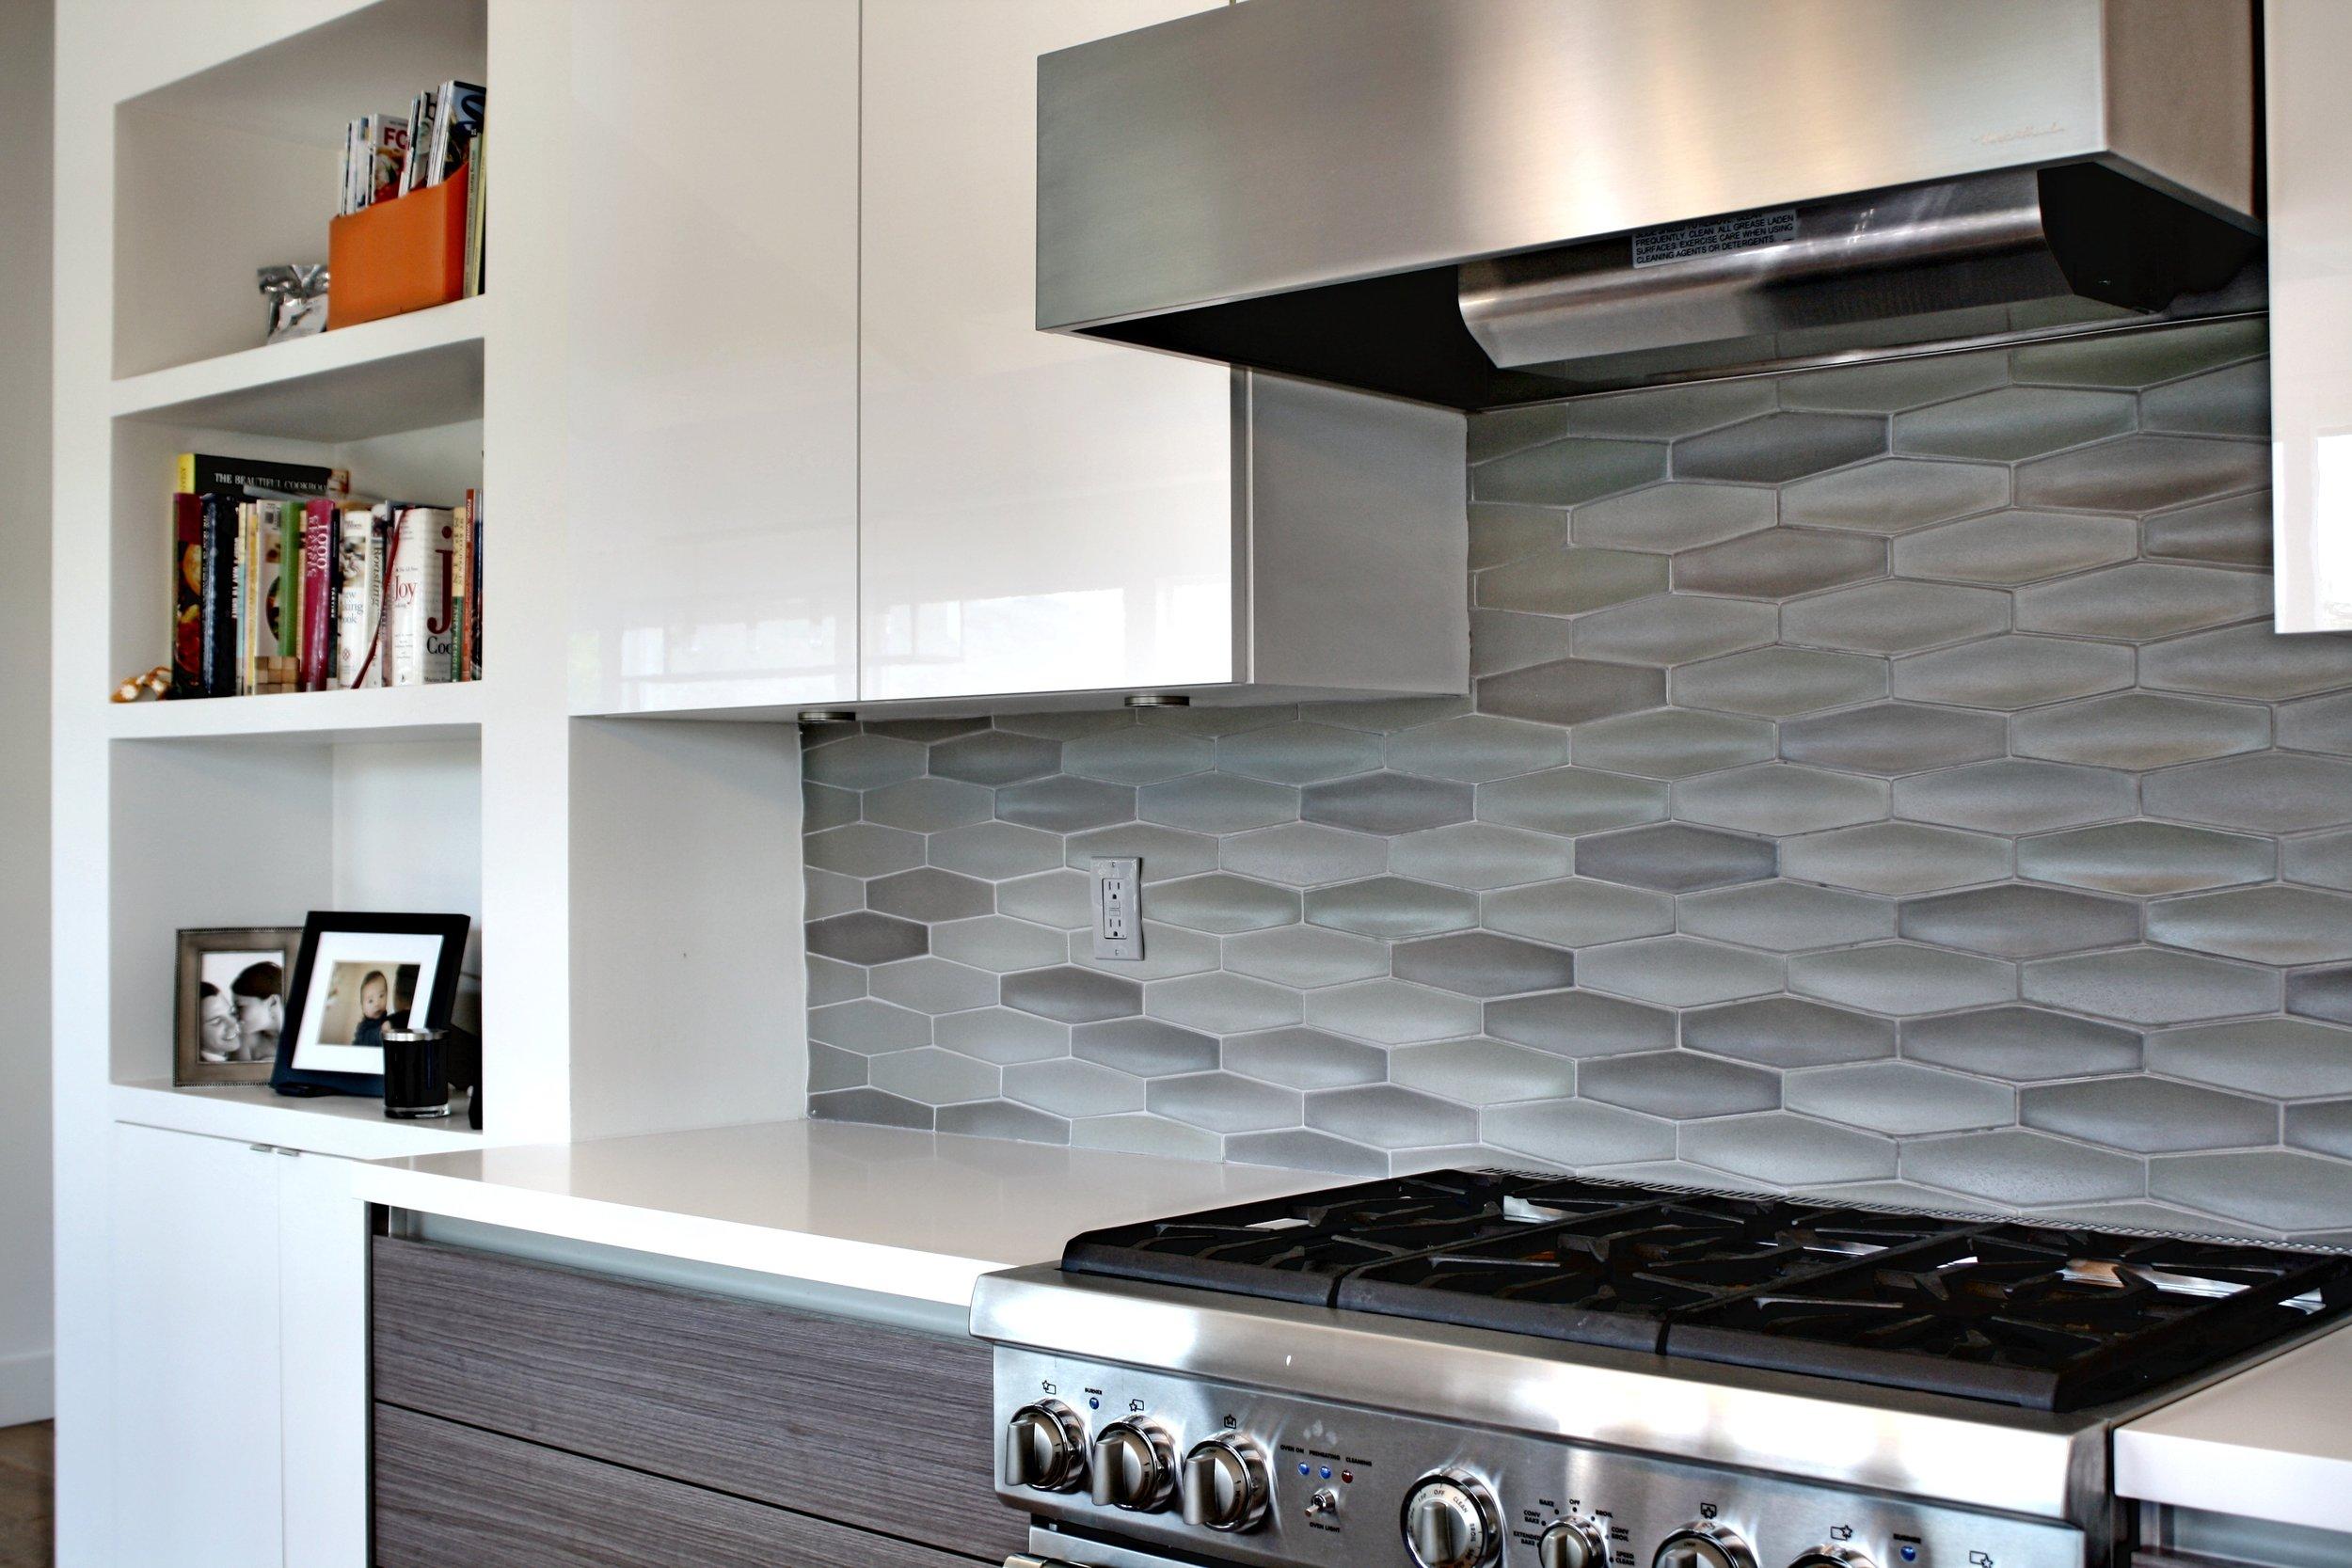 william-adams-design-interior-design-and-architecture-home-remodeling-san-francisco-california-mill-valley-mid-century-kitchen-design-white-grey-wood-flooring-1.jpg